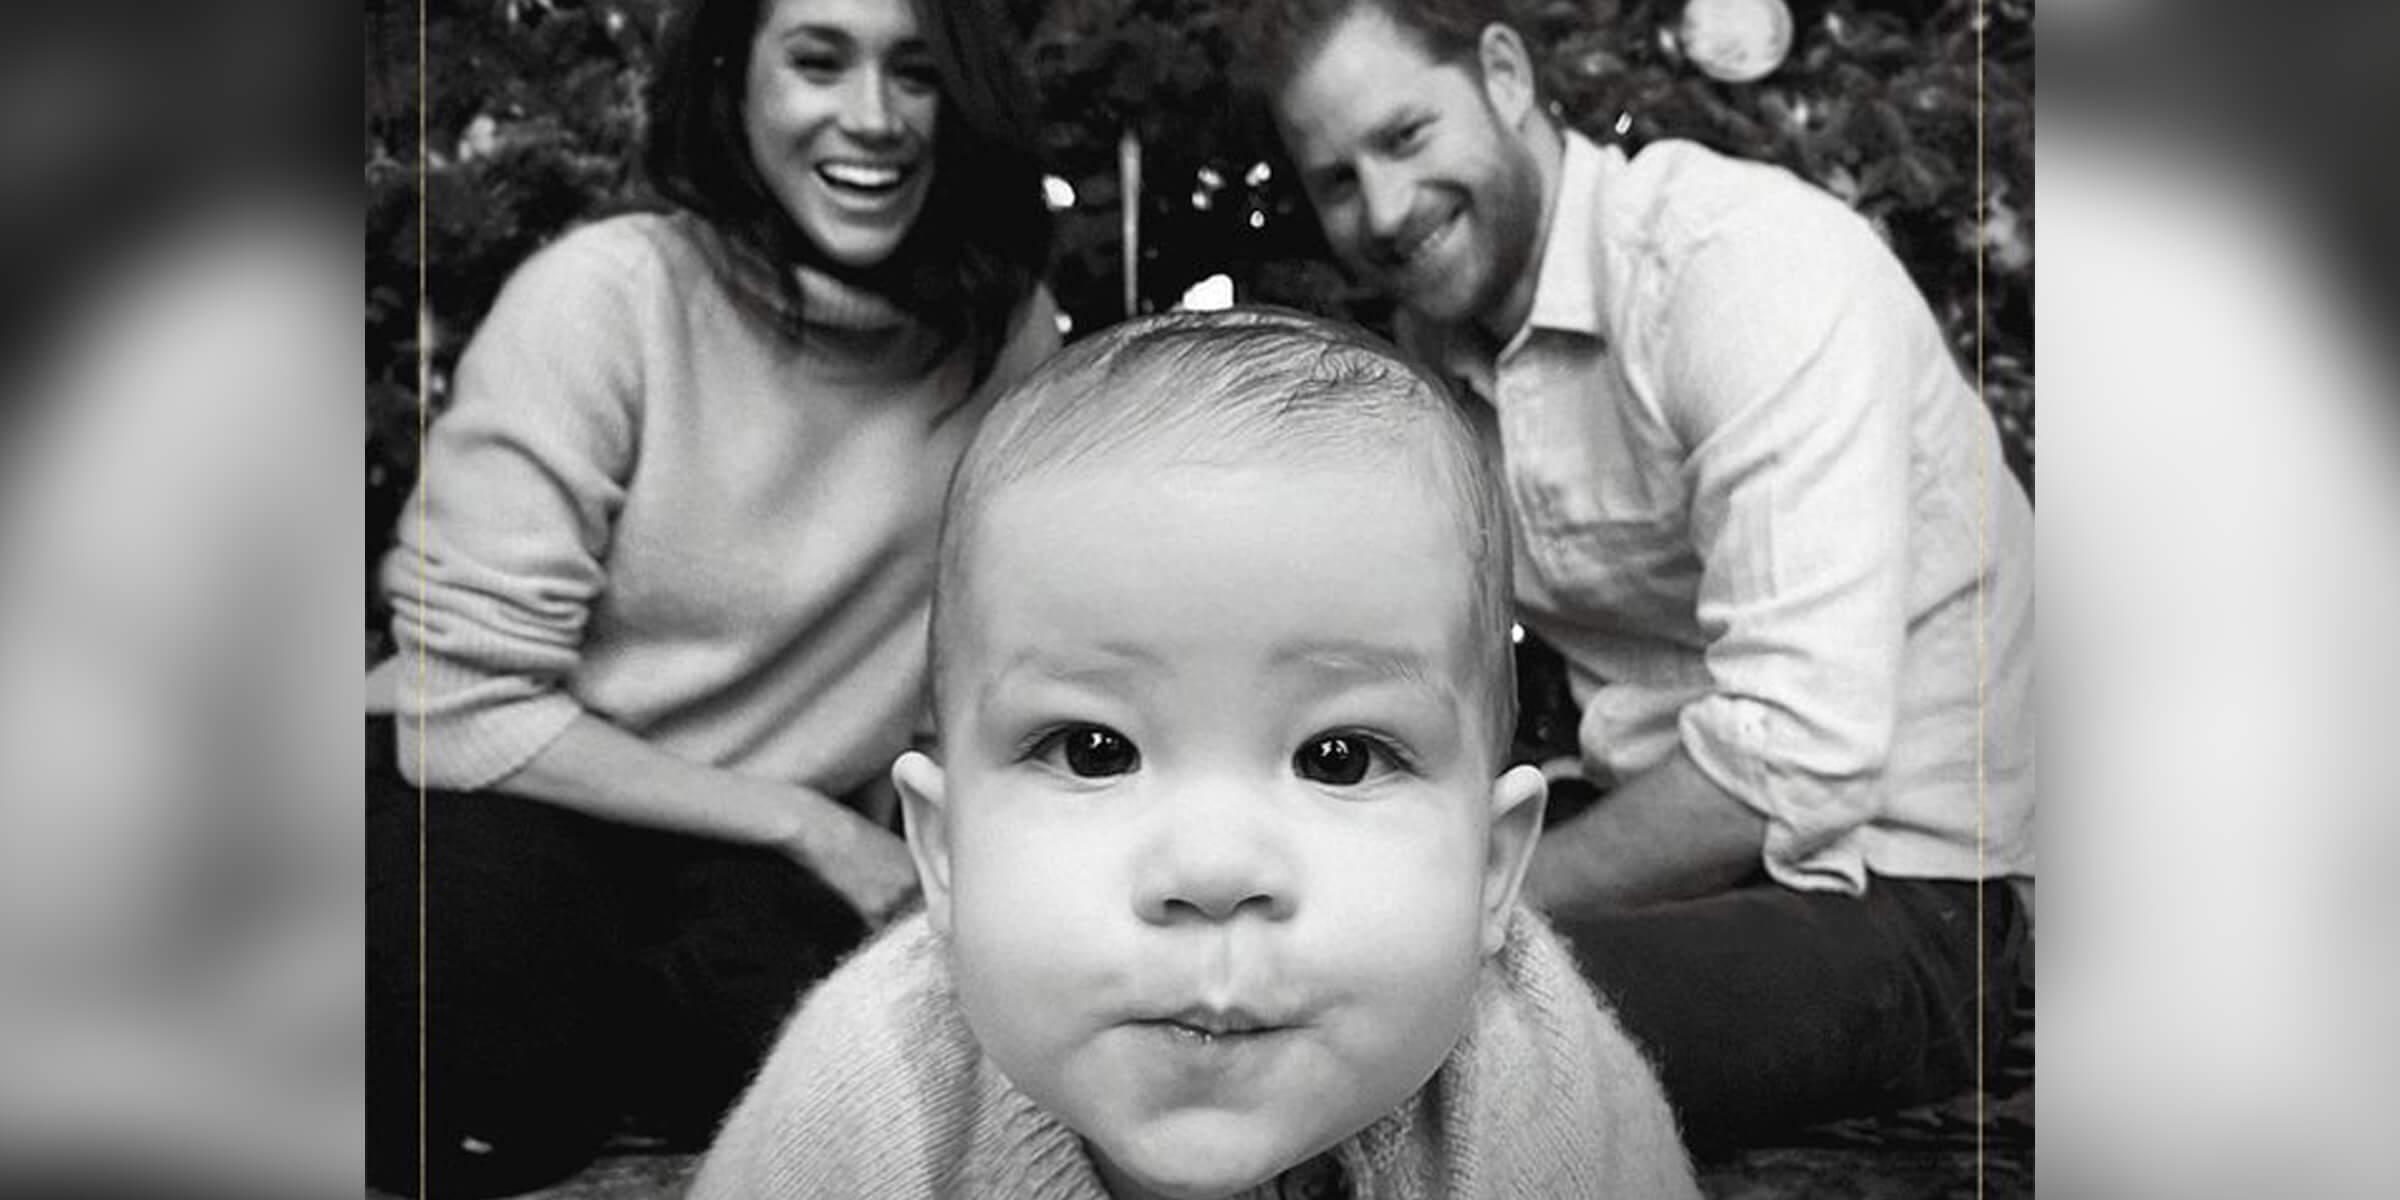 Меган Маркл, принц Гарри и малыш Арчи провели Рождество в Канаде   Rubic.us